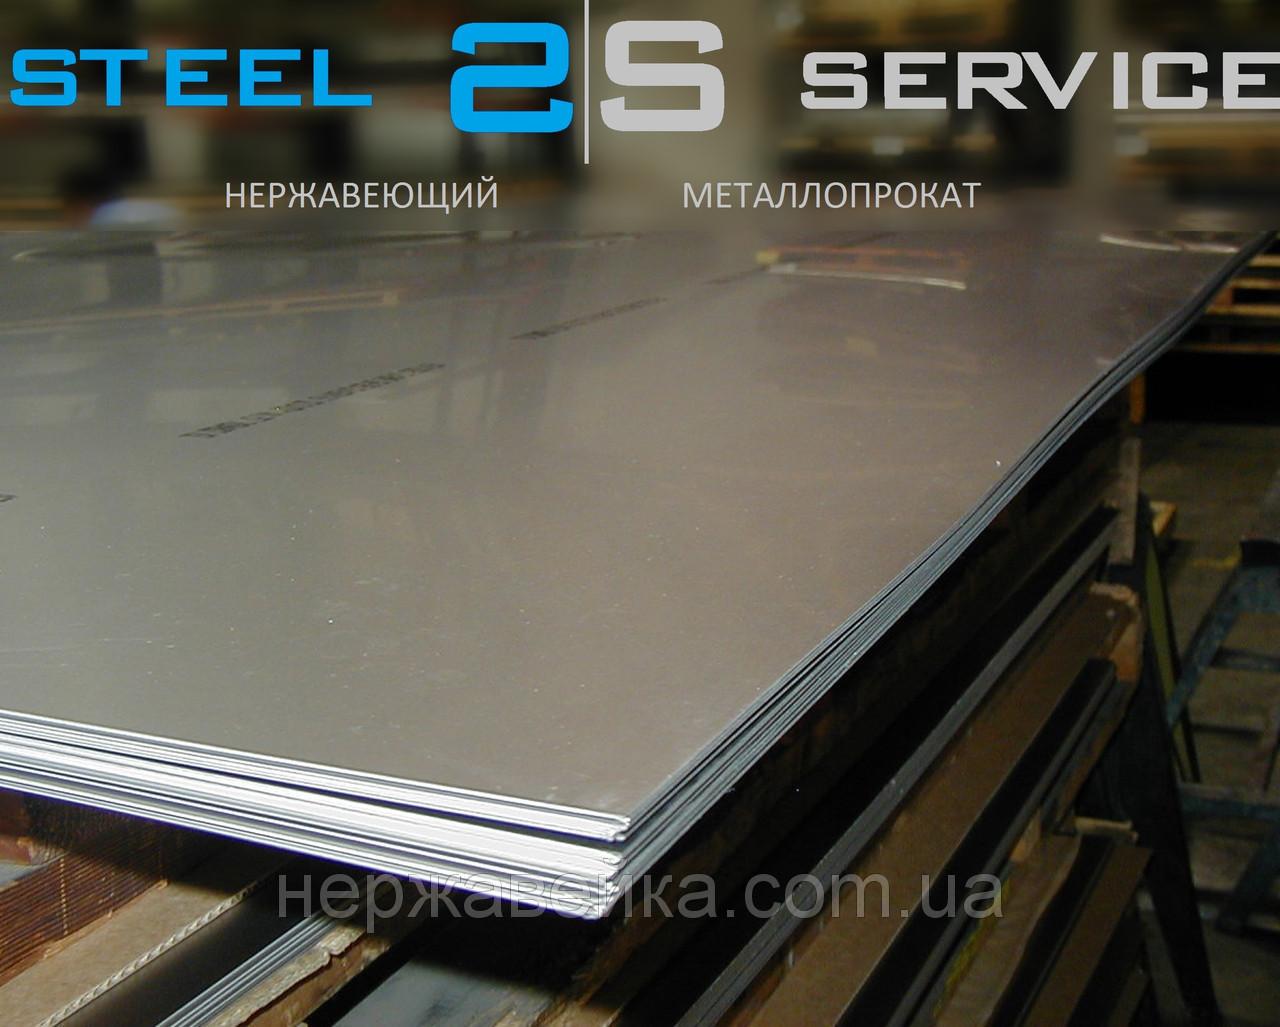 Нержавейка лист 0,8х1250х2500мм AISI 409(08Х13) 2B - матовый, технический